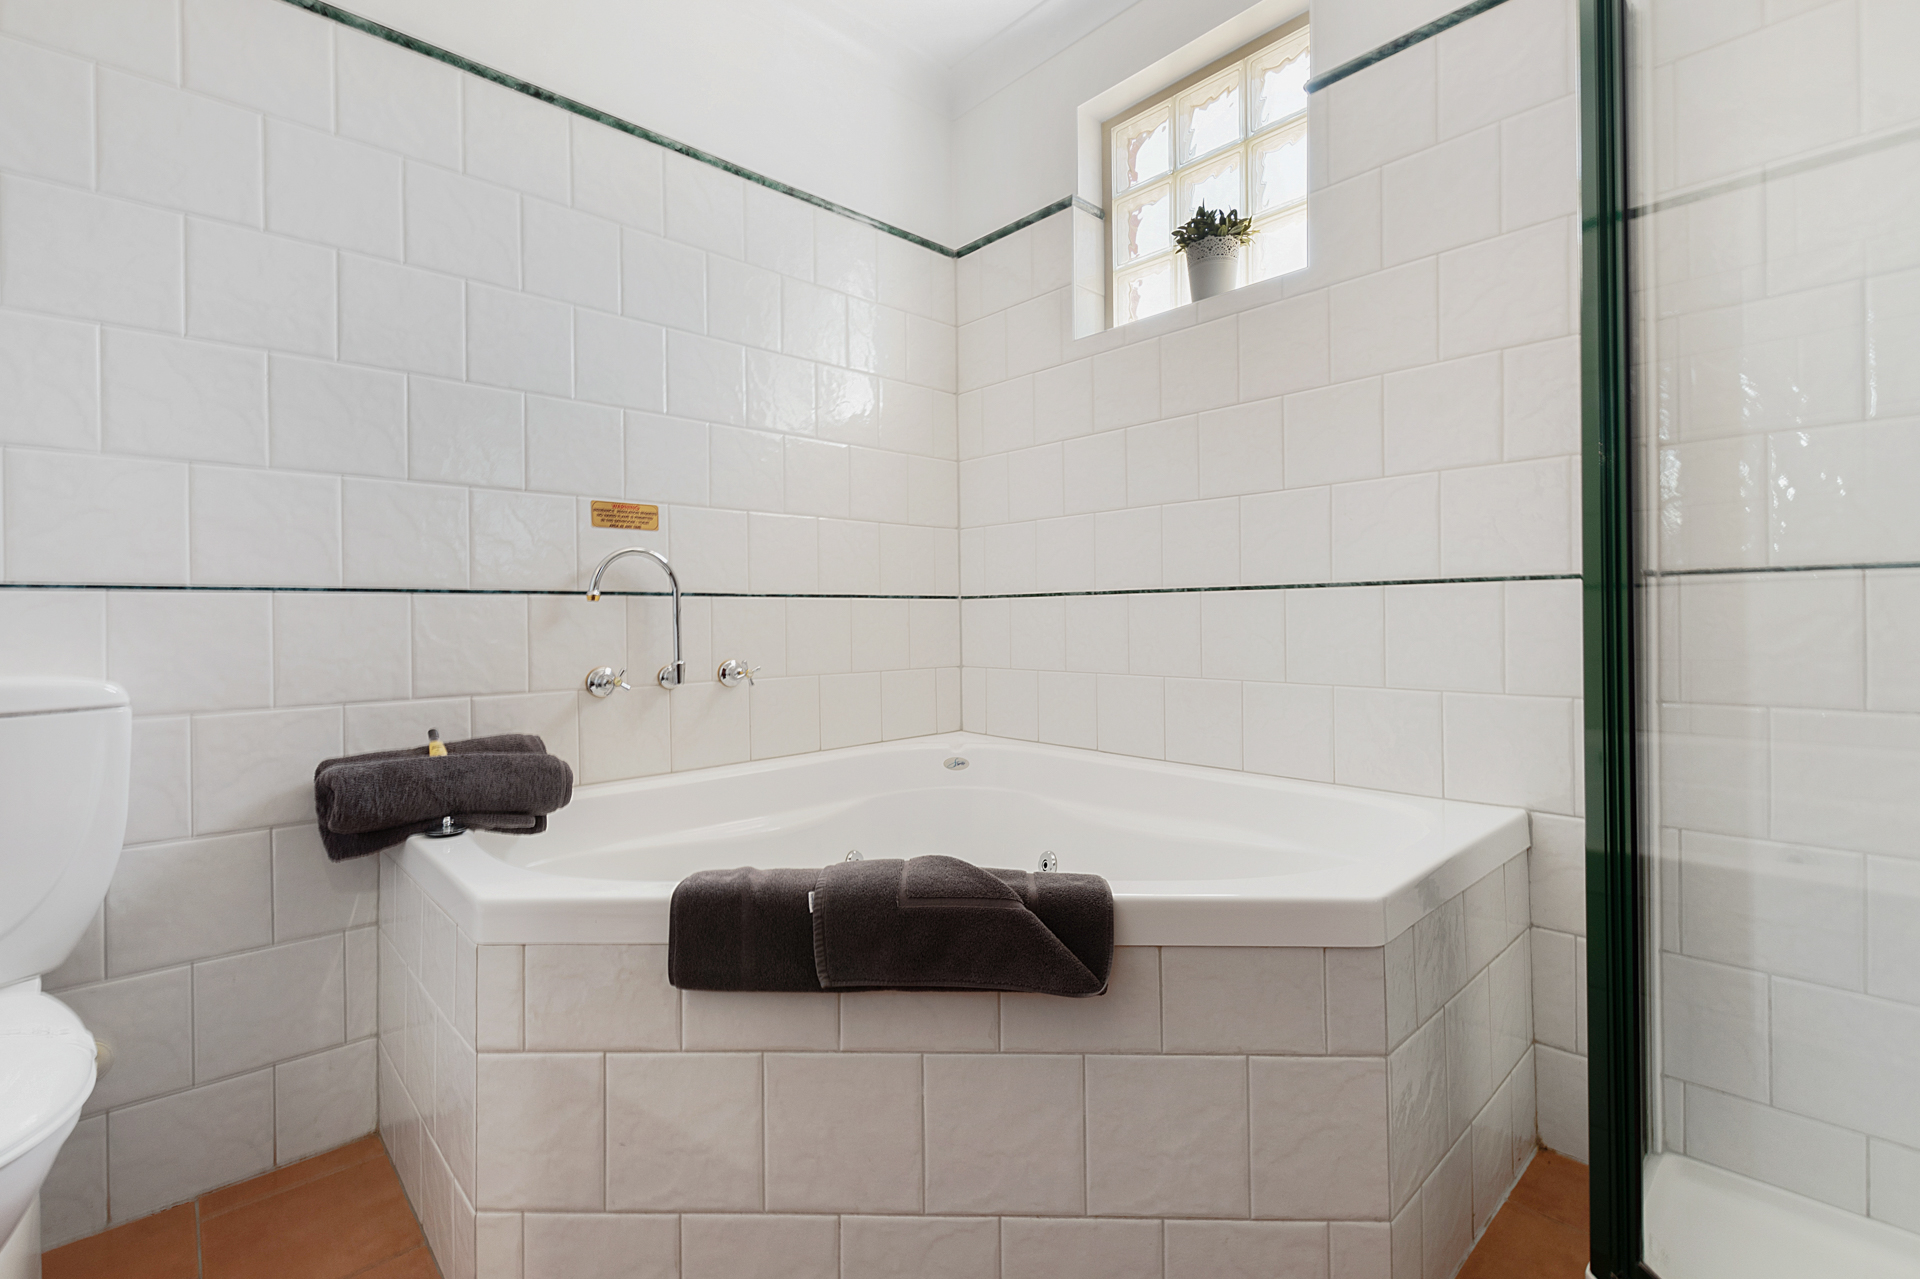 King Spa Suite Bathtub